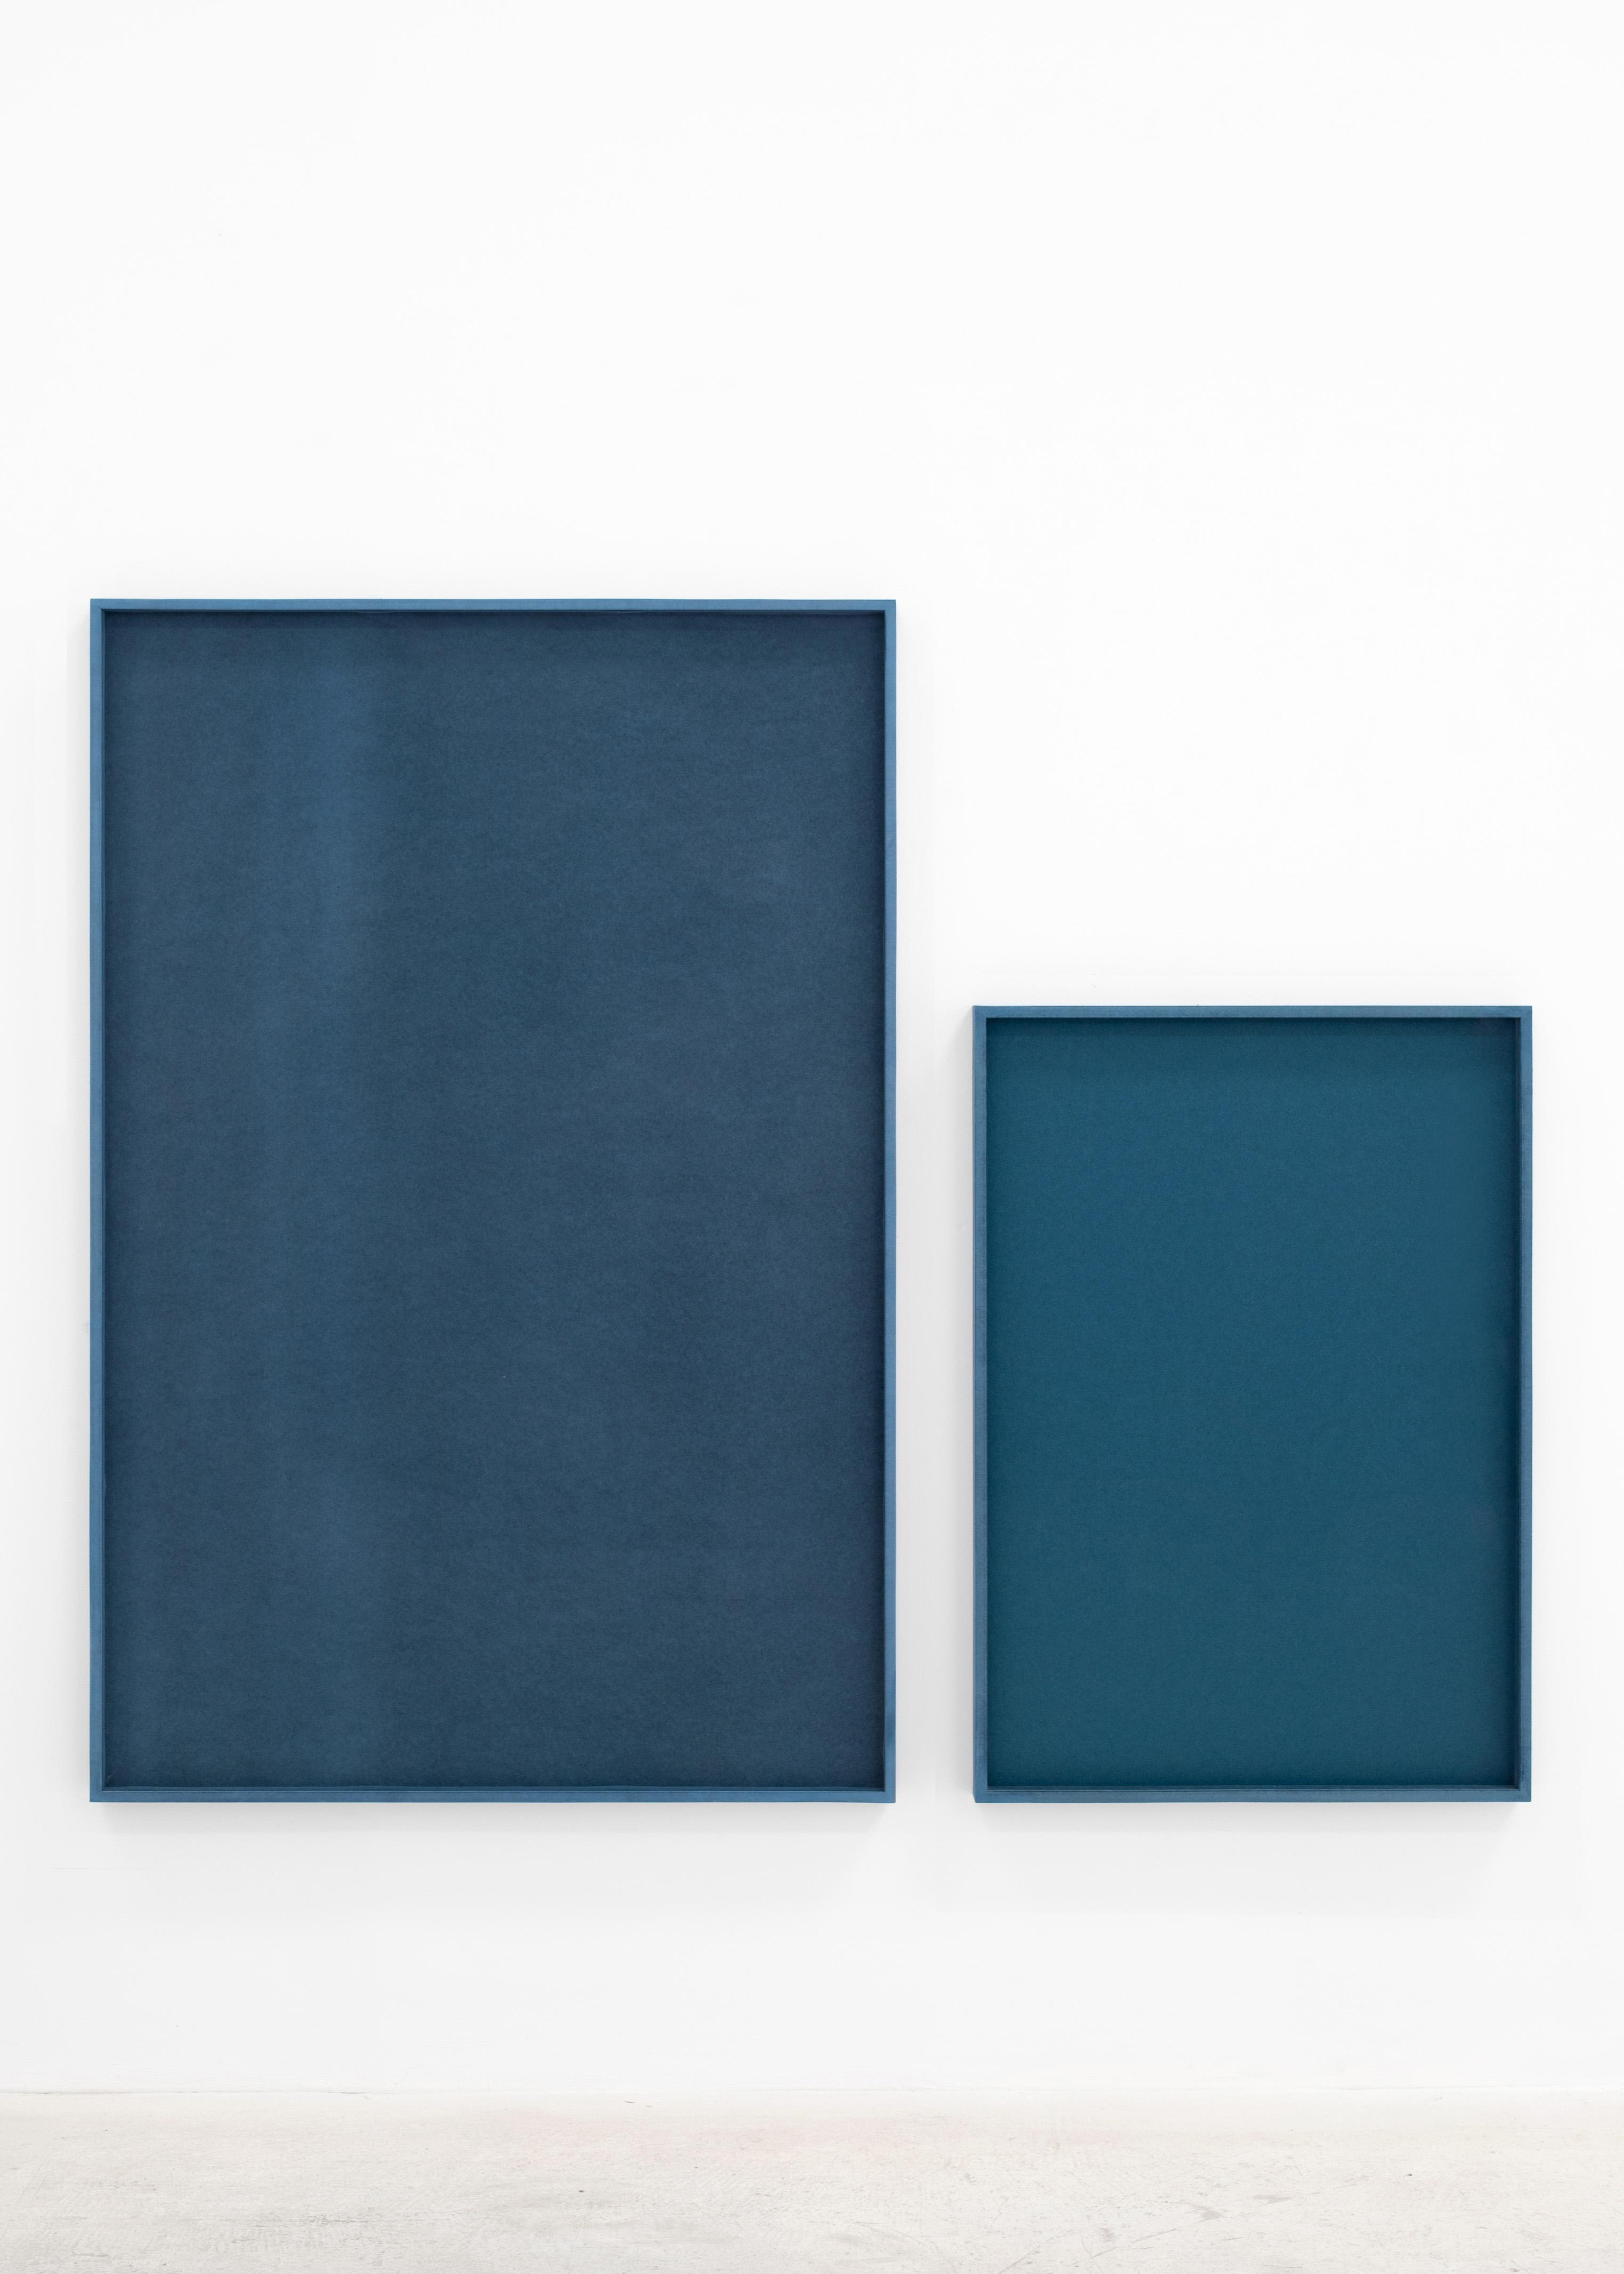 IRMA ÁLVAREZ LAVIADA S.T (Azul), 2021, Irma Álvarez-Laviada: TODO SE PARECE A ALGO , L21, 14 May – 23 June. Courtesy: L21 Gallery